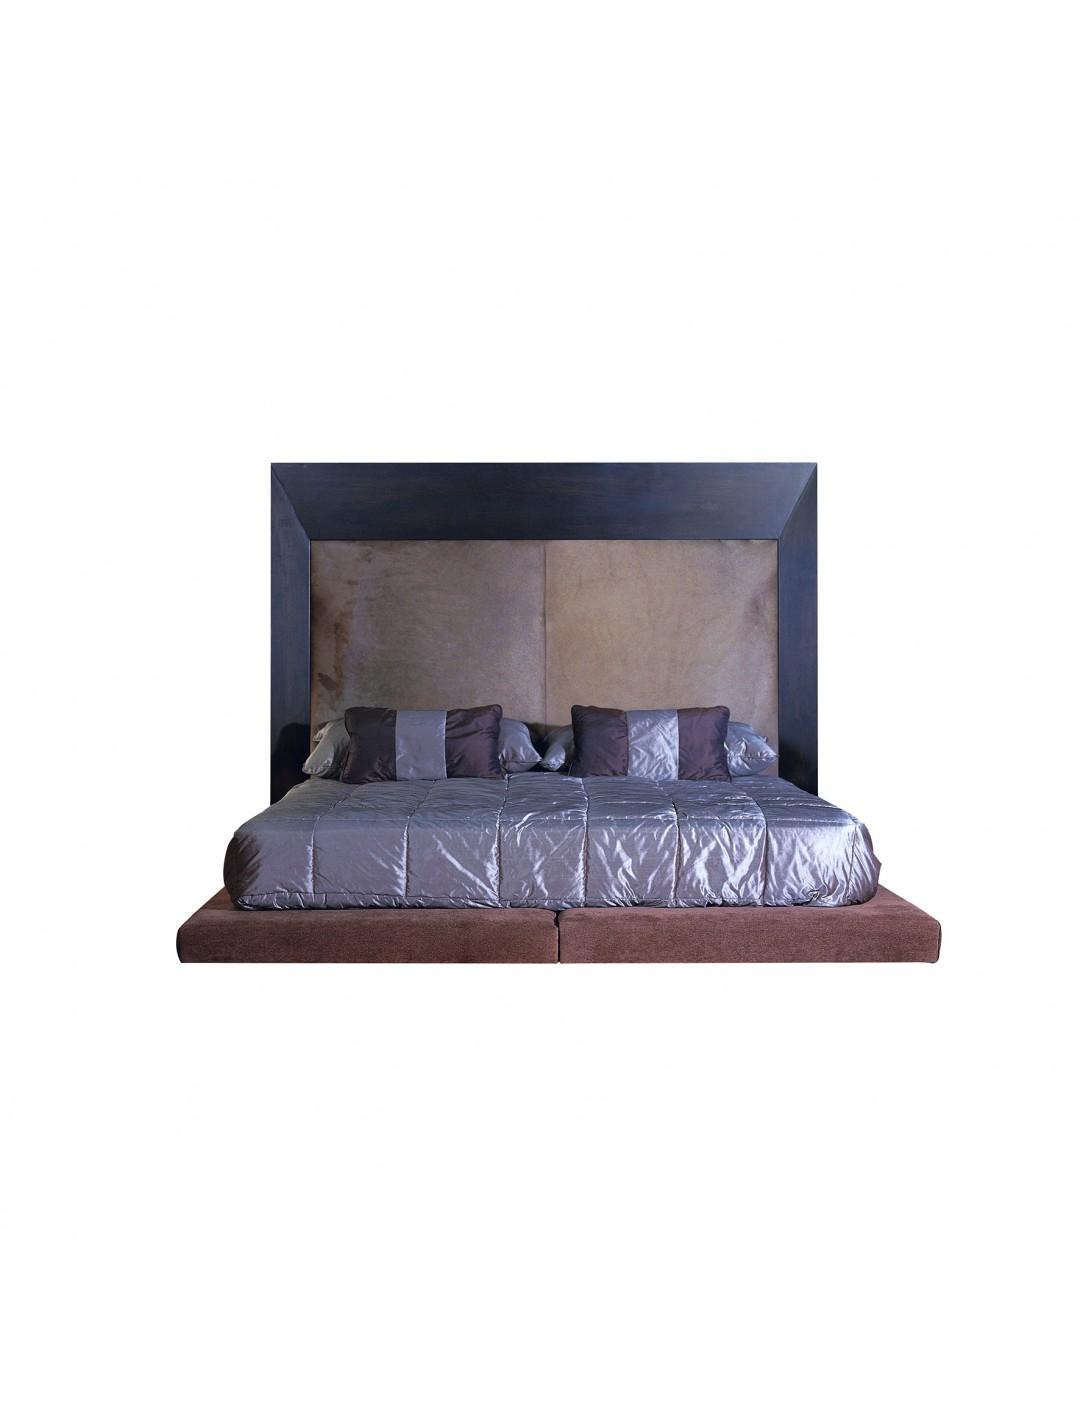 BERTA BED (FOR 160X200 CM MATTRESS)